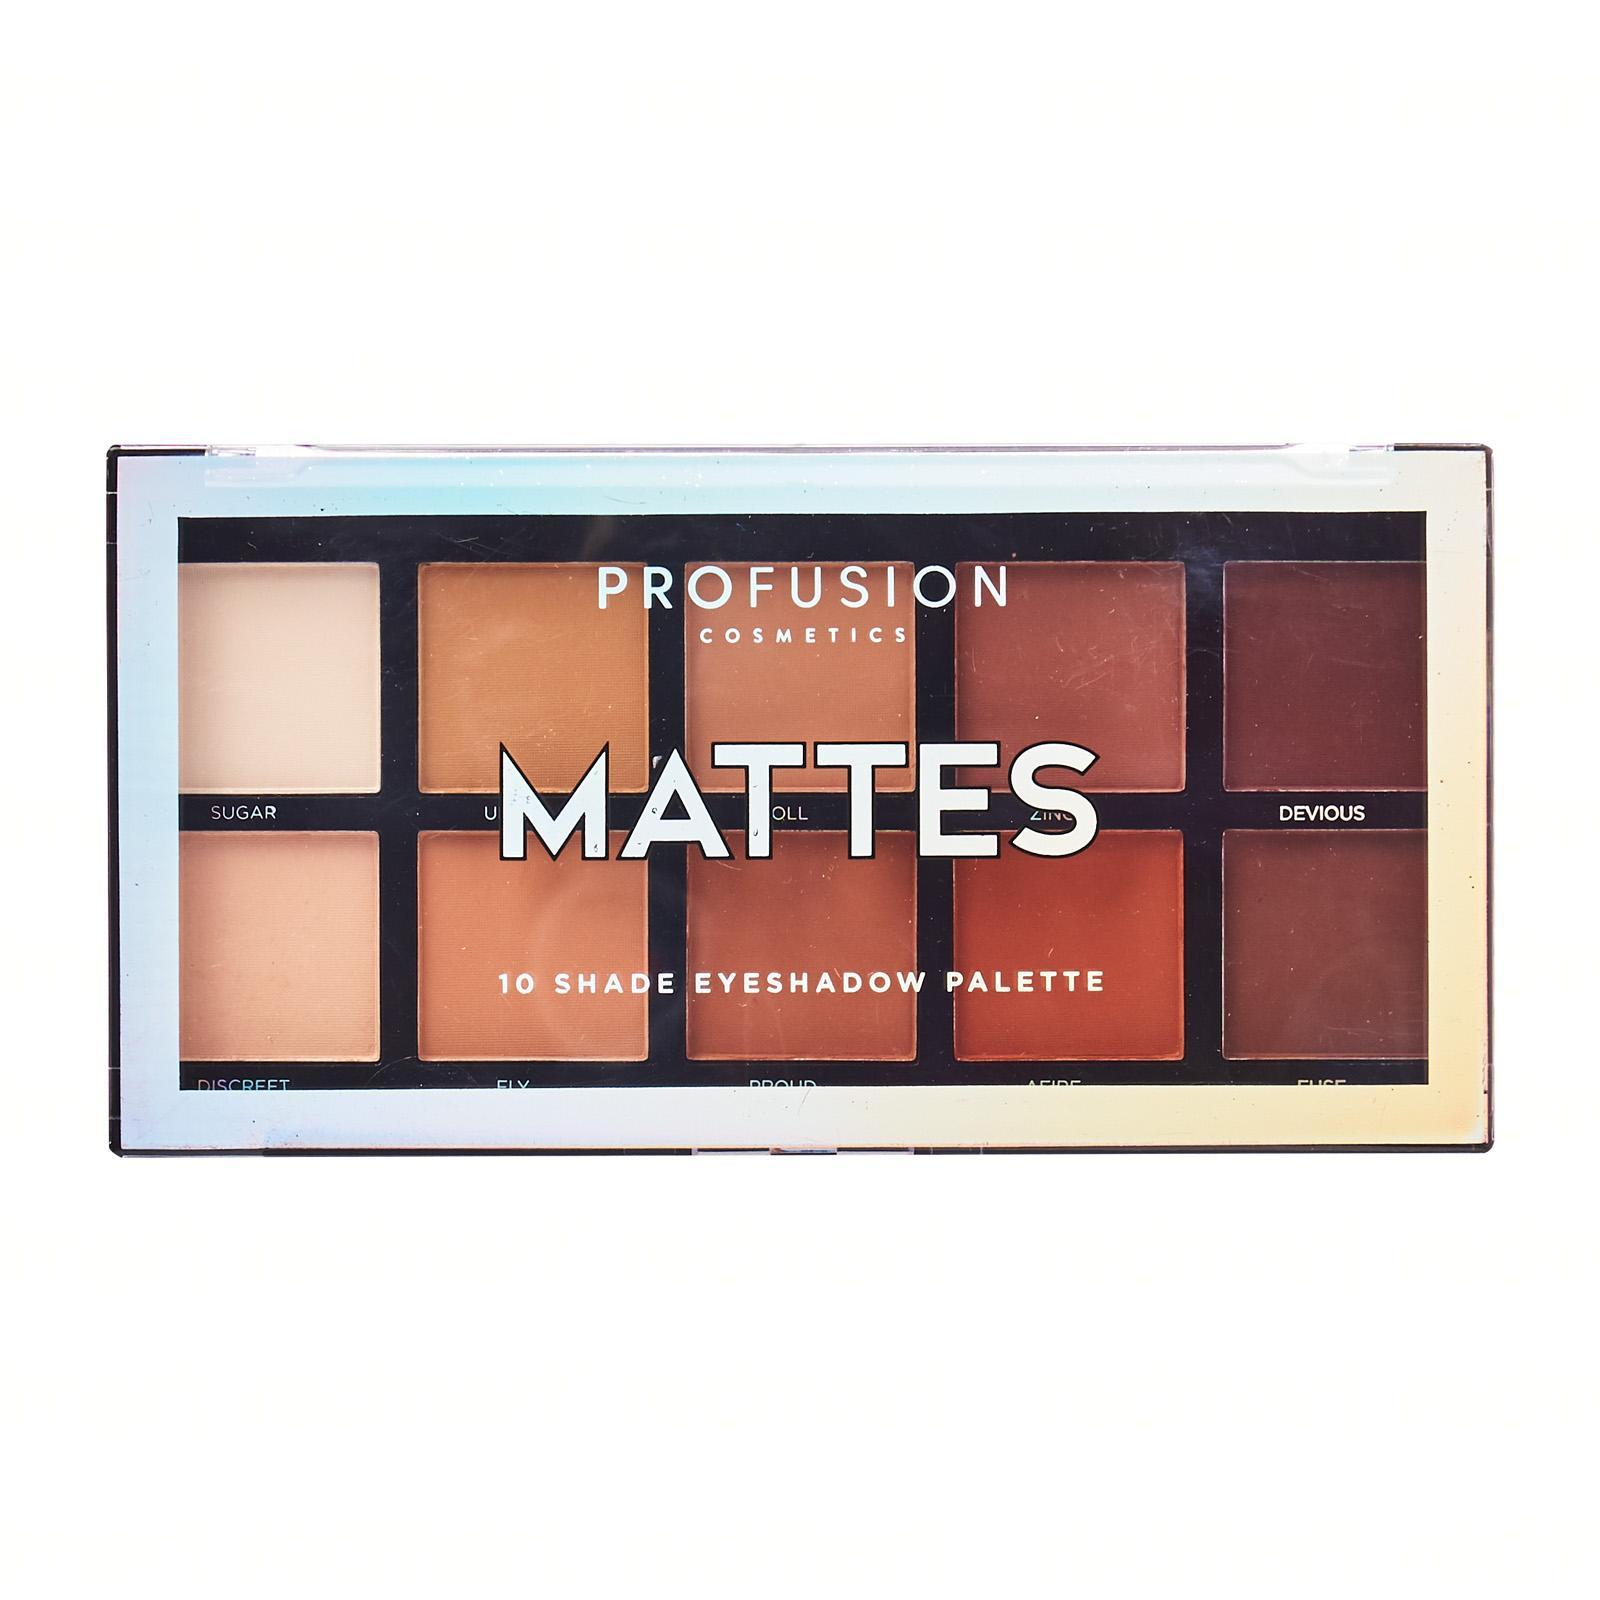 Profusion Cosmetics Mattes Eyeshadow Palette